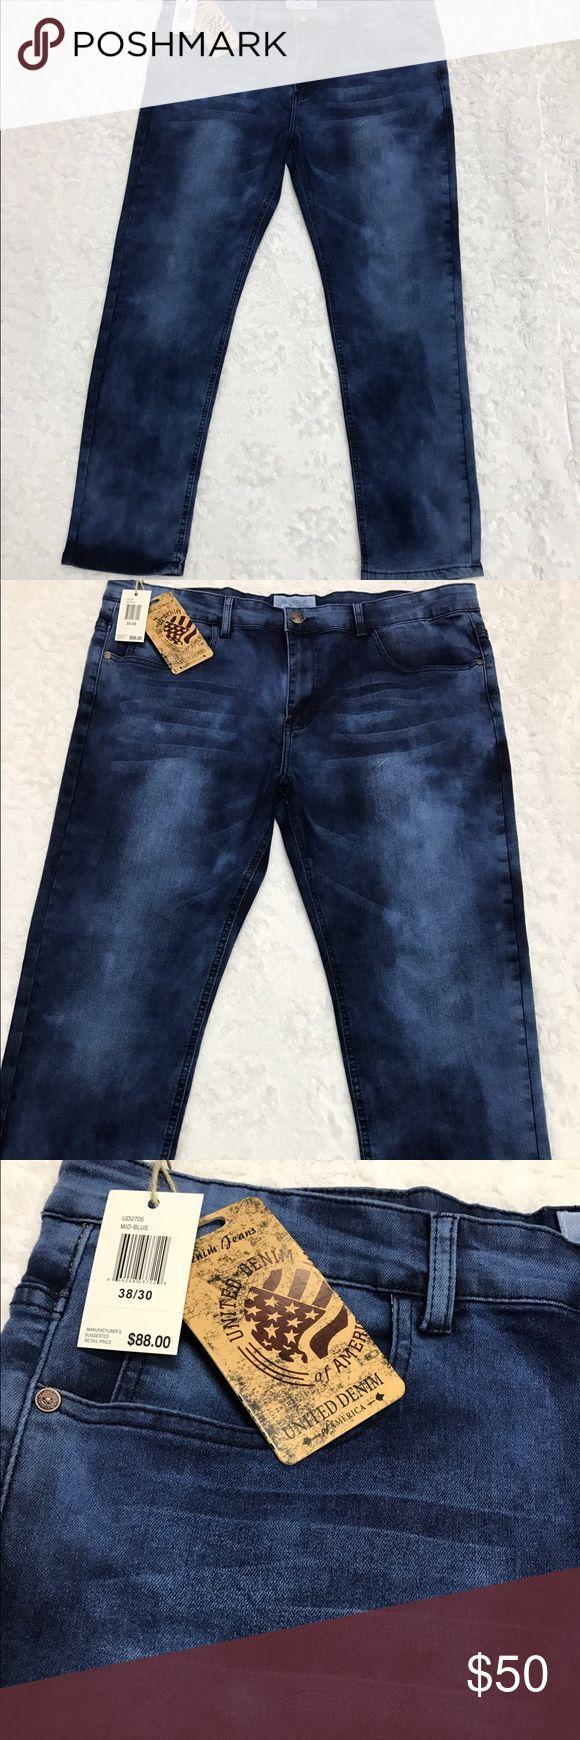 United Denim Of America Men's Acid Wash Jeans NWT United Denim Of America Men's Acid Wash size 38/30 jeans. Retailed: $88. United Denim Of America Jeans Bootcut